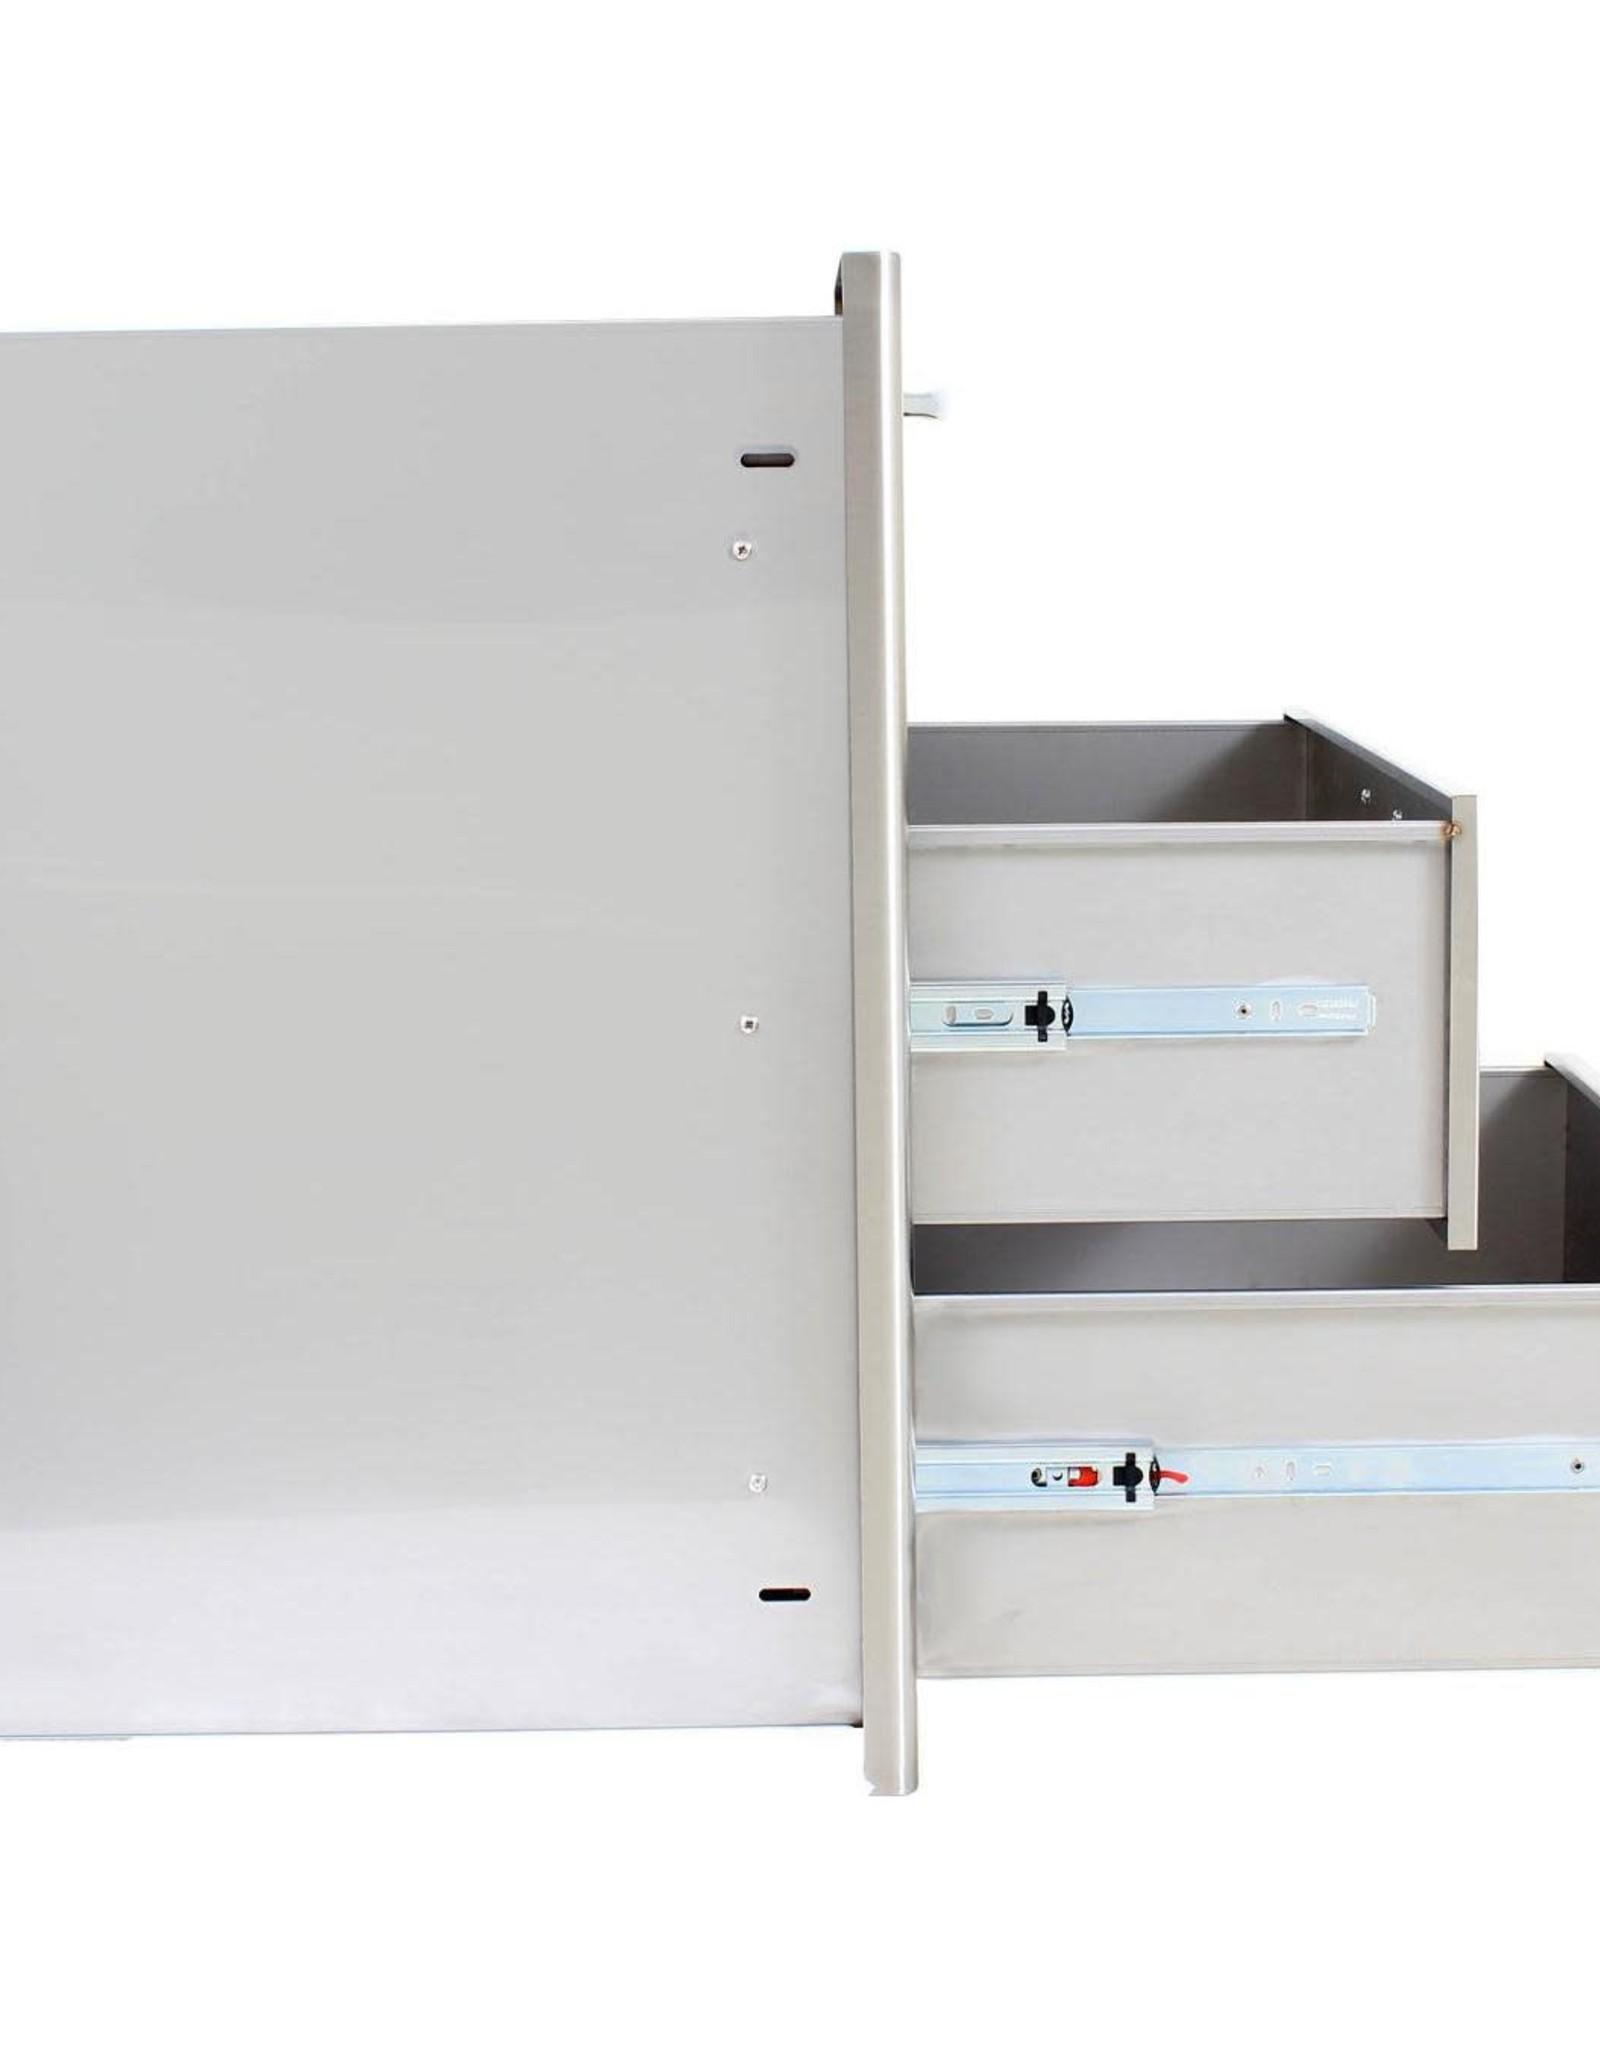 Blaze Outdoor Products Blaze 30-Inch Stainless Steel Triple Access Drawer - BLZ-30W-3DRW